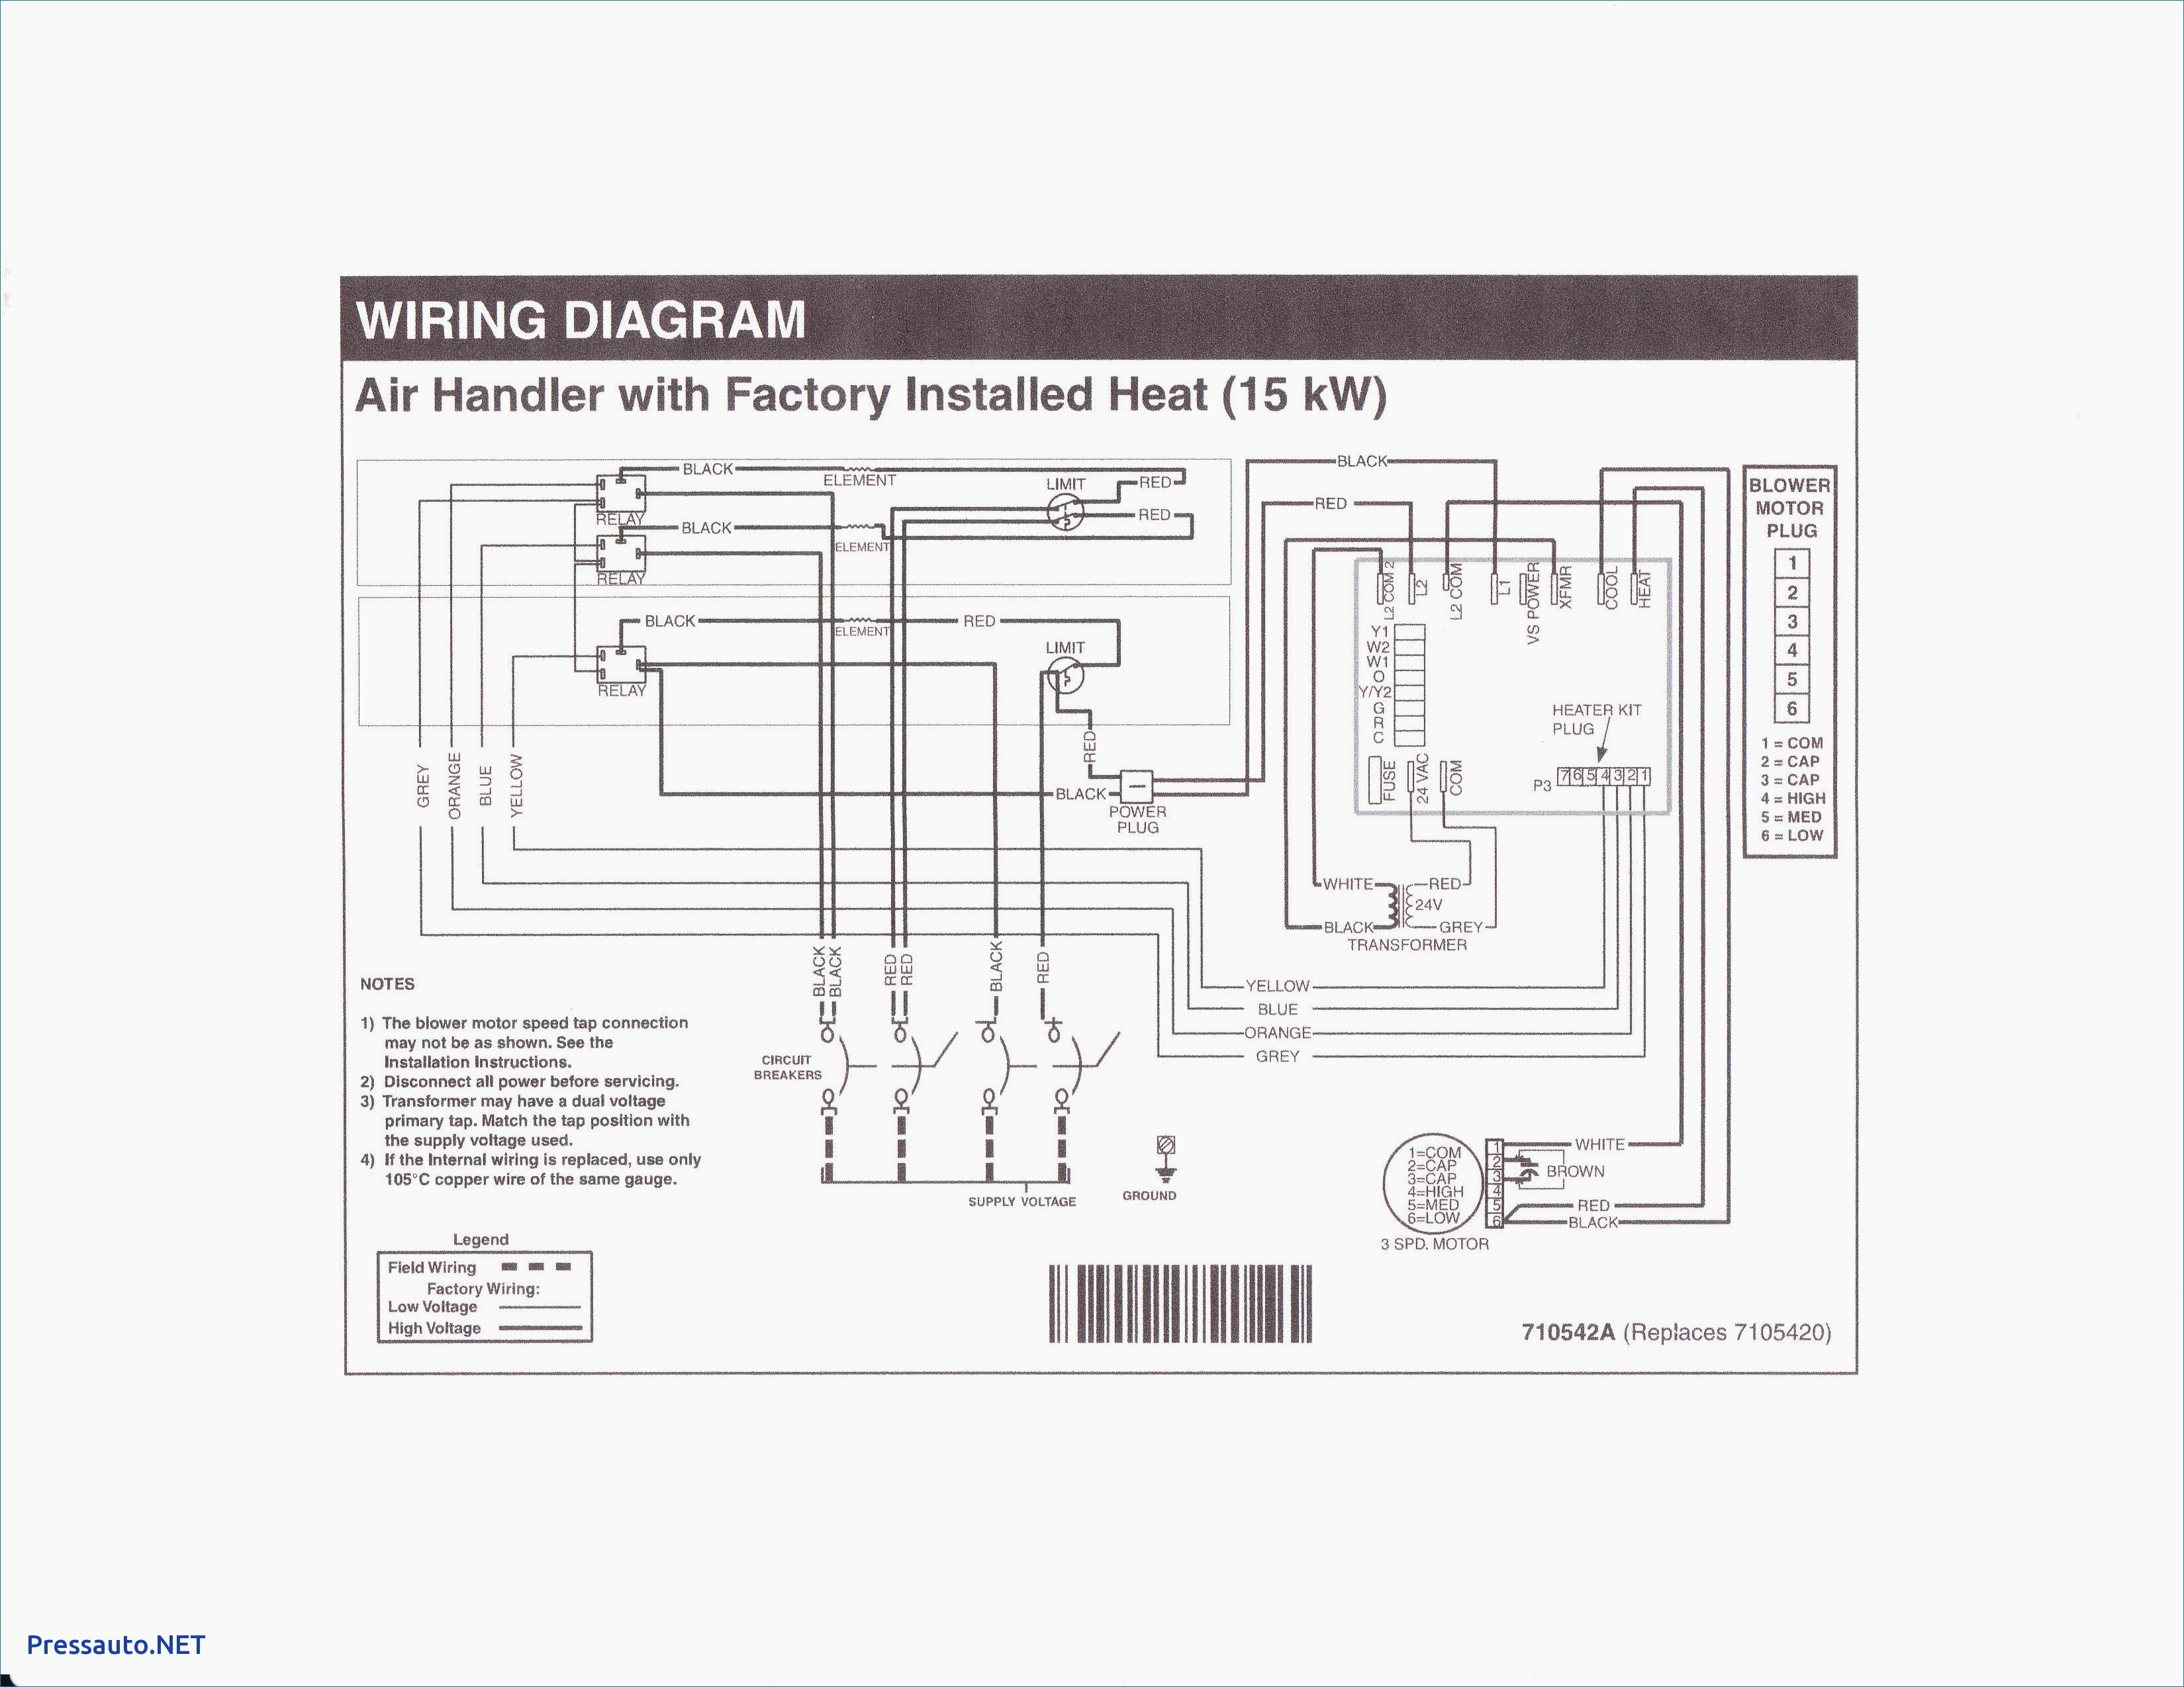 oil furnace wiring schematic manual guide wiring diagrammobile home furnace wiring diagram free picture wiring diagram panelmobile home furnace wiring diagram beckett basic